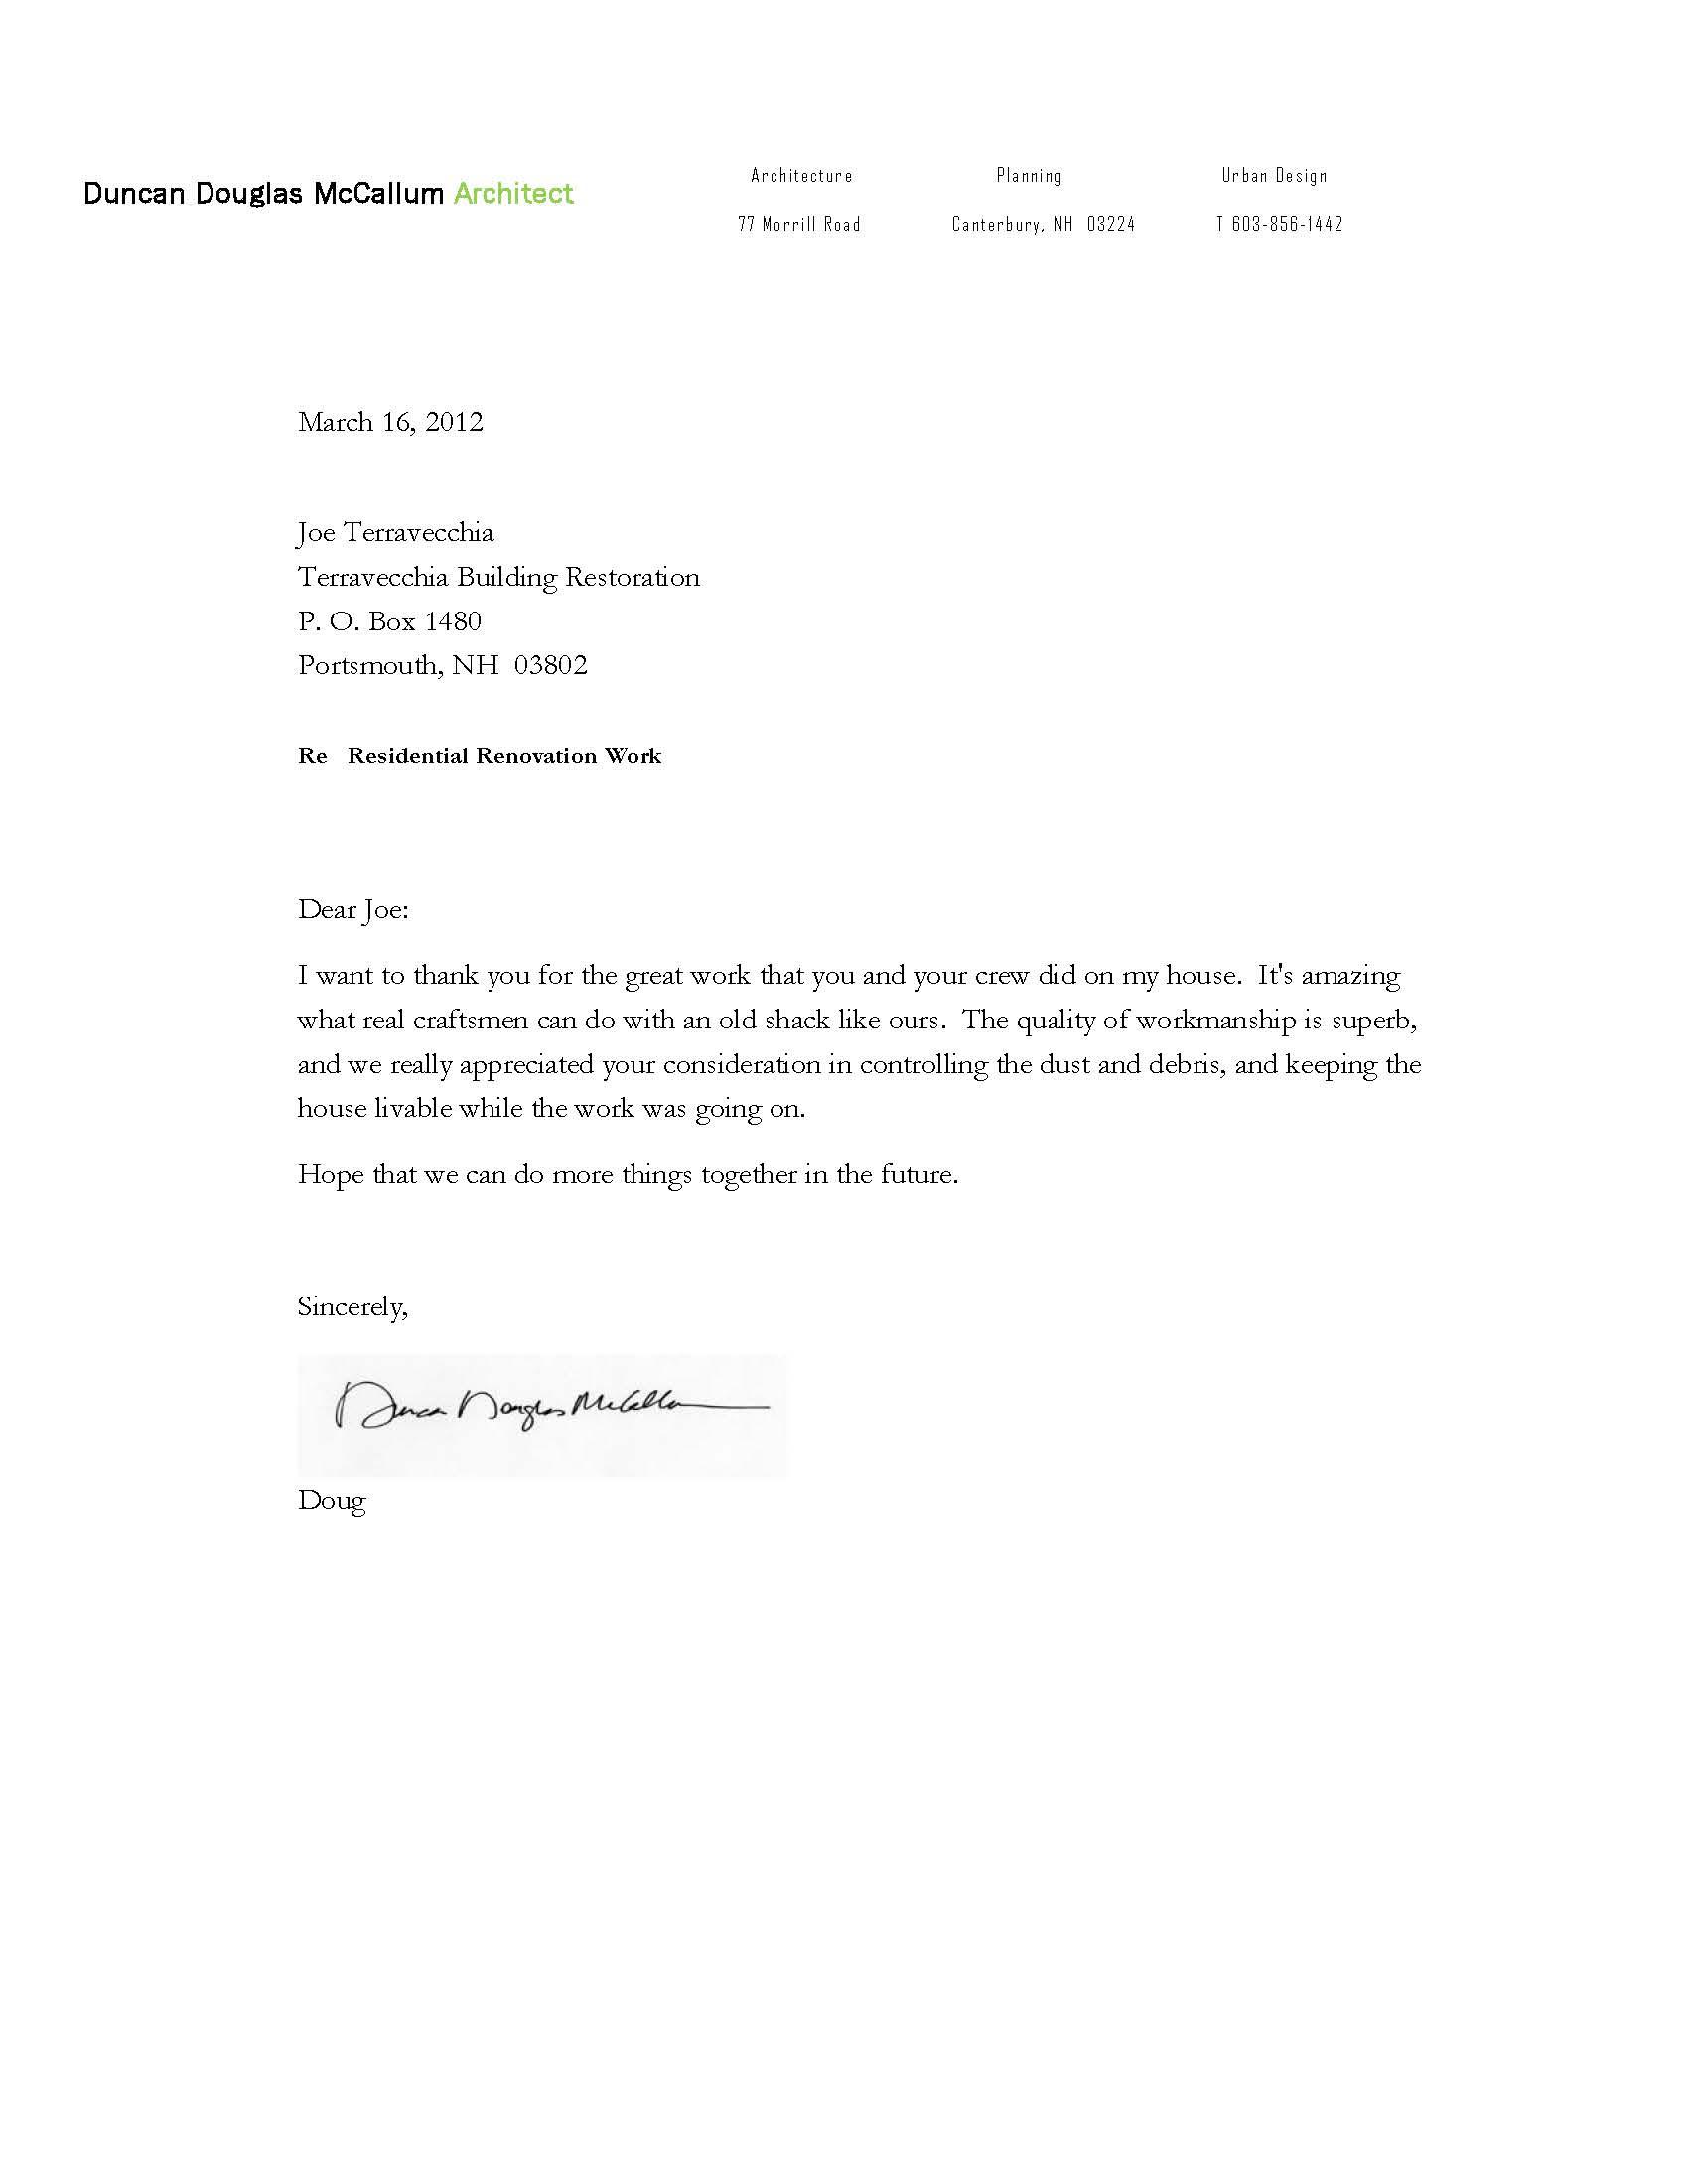 Testimonial from Duncan Douglas McCallum, Architect